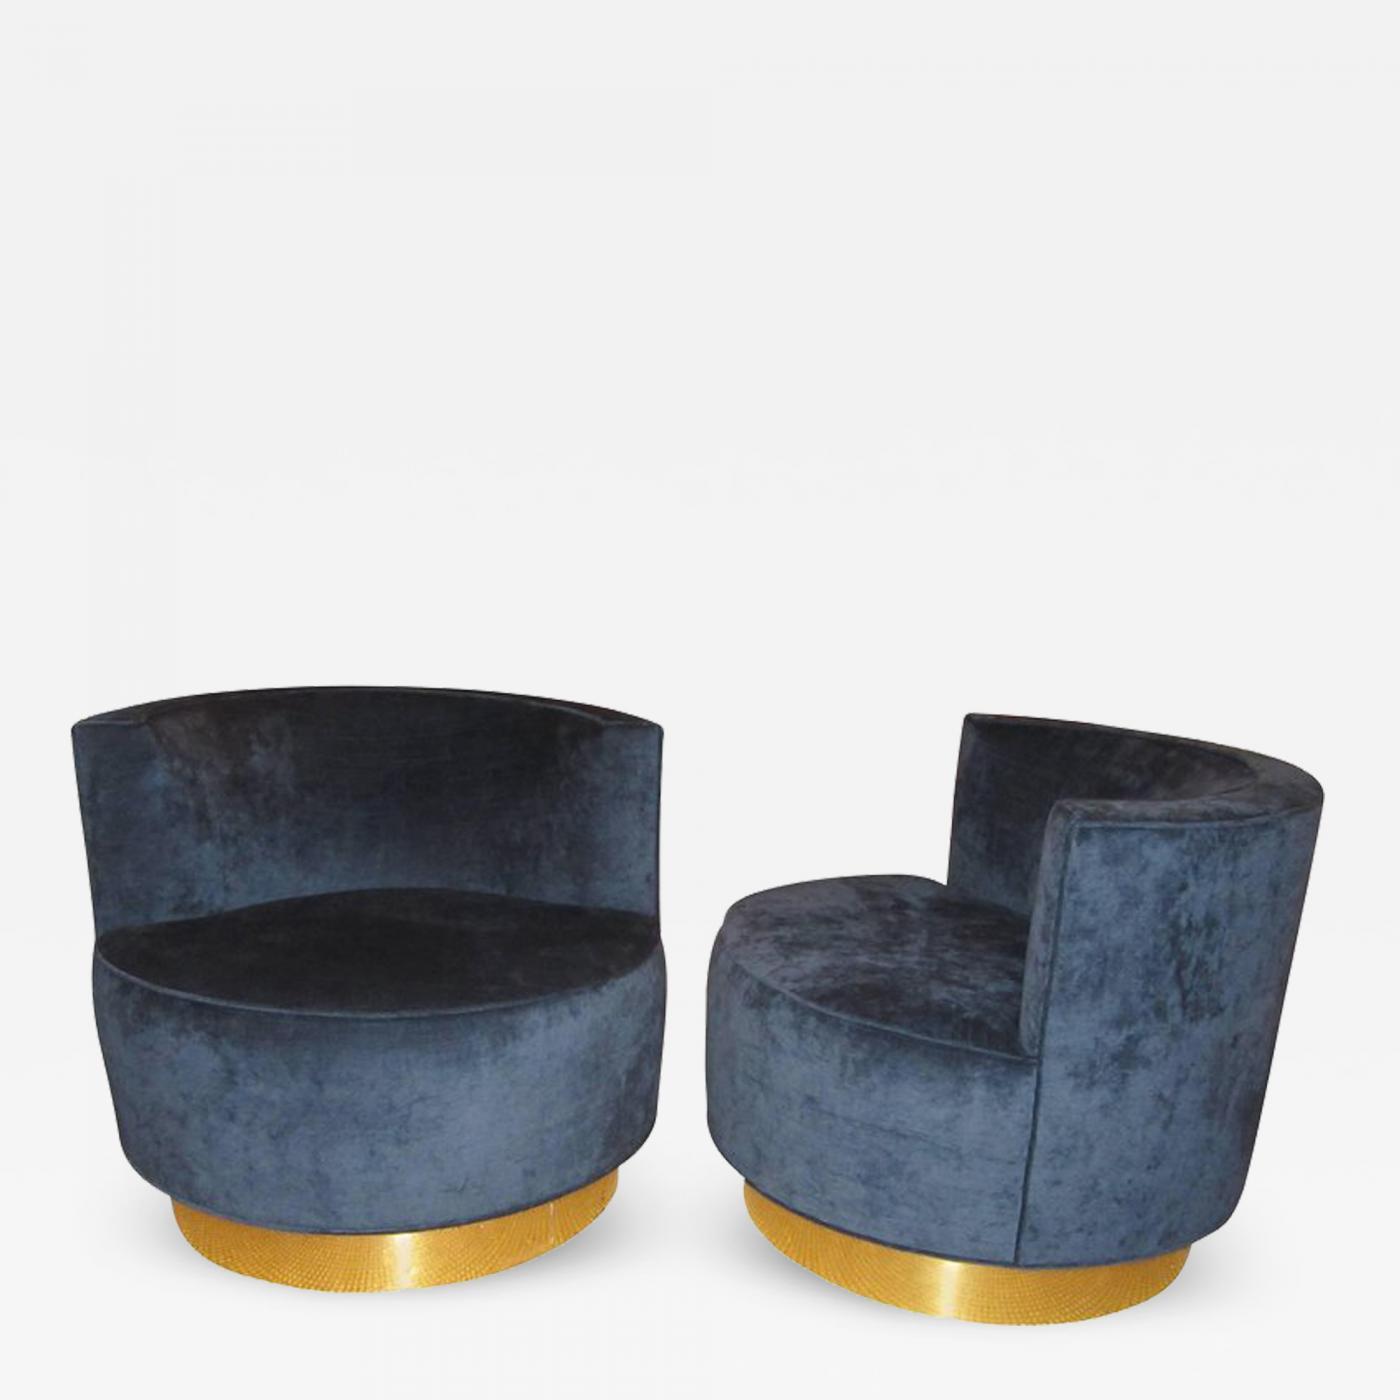 Surprising Pair Of Mid Century Modern Swivel Barrel Chairs Theyellowbook Wood Chair Design Ideas Theyellowbookinfo